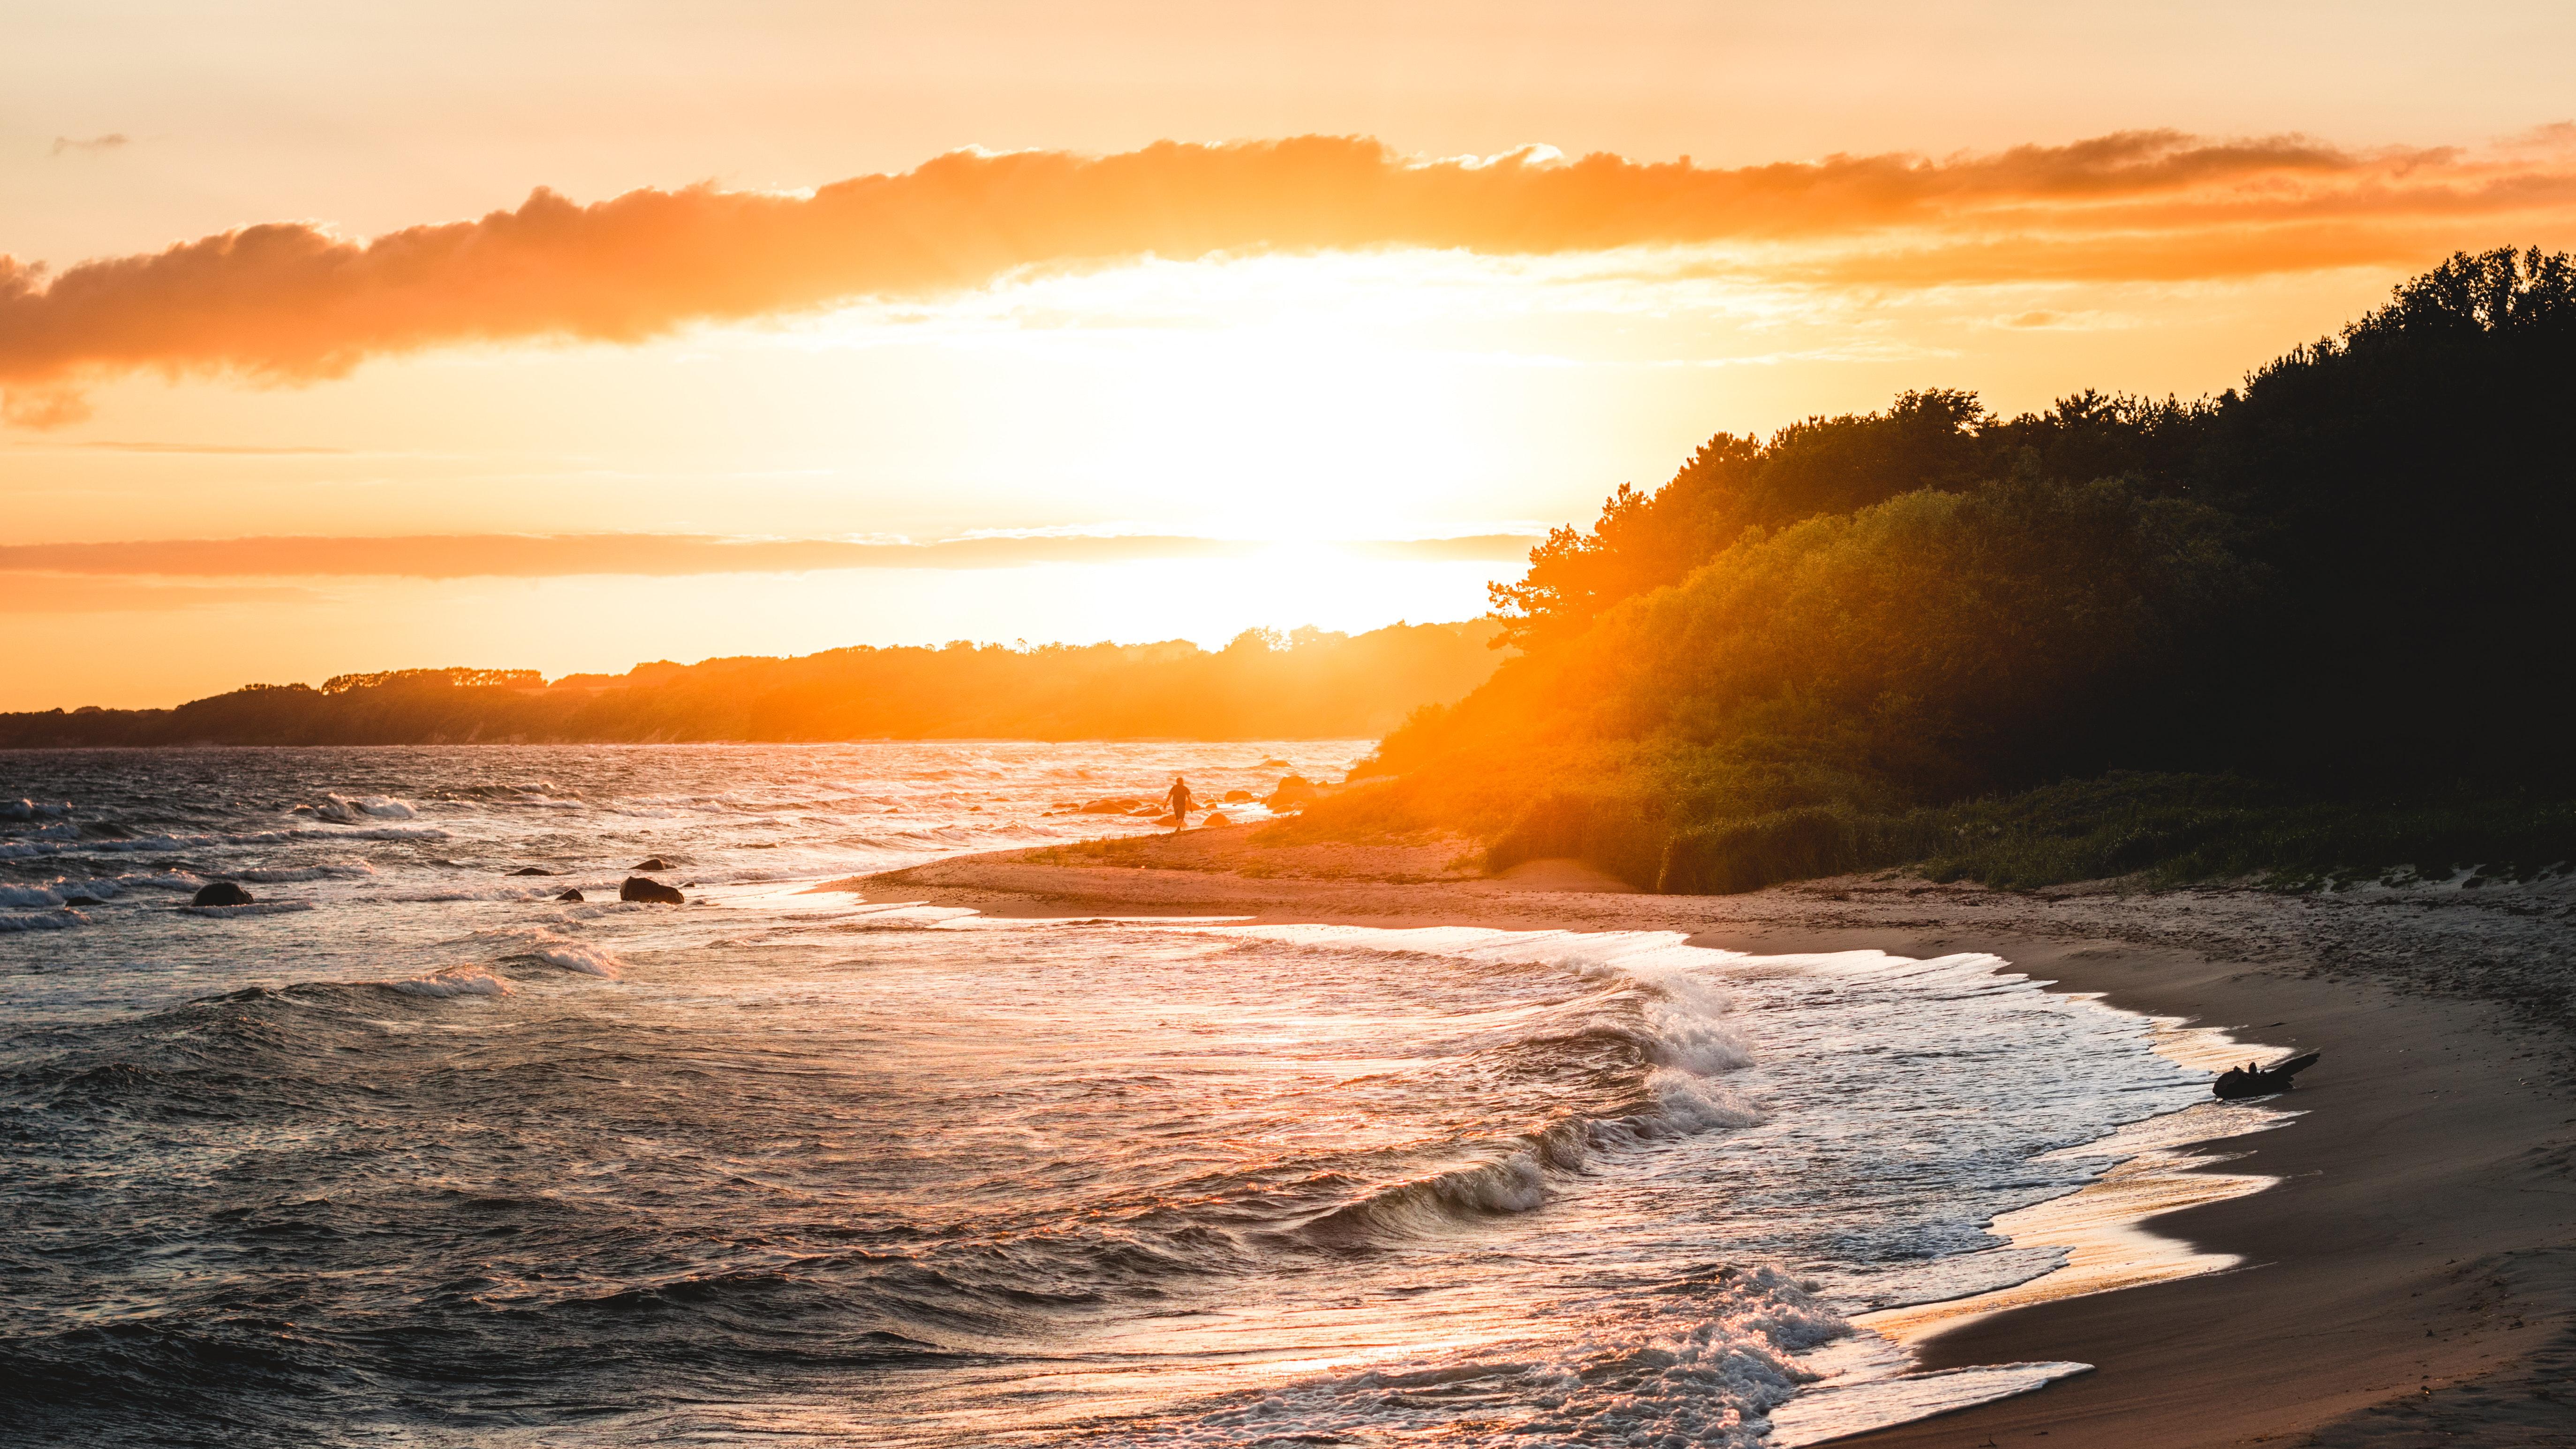 Gray sand beach during sunset photo